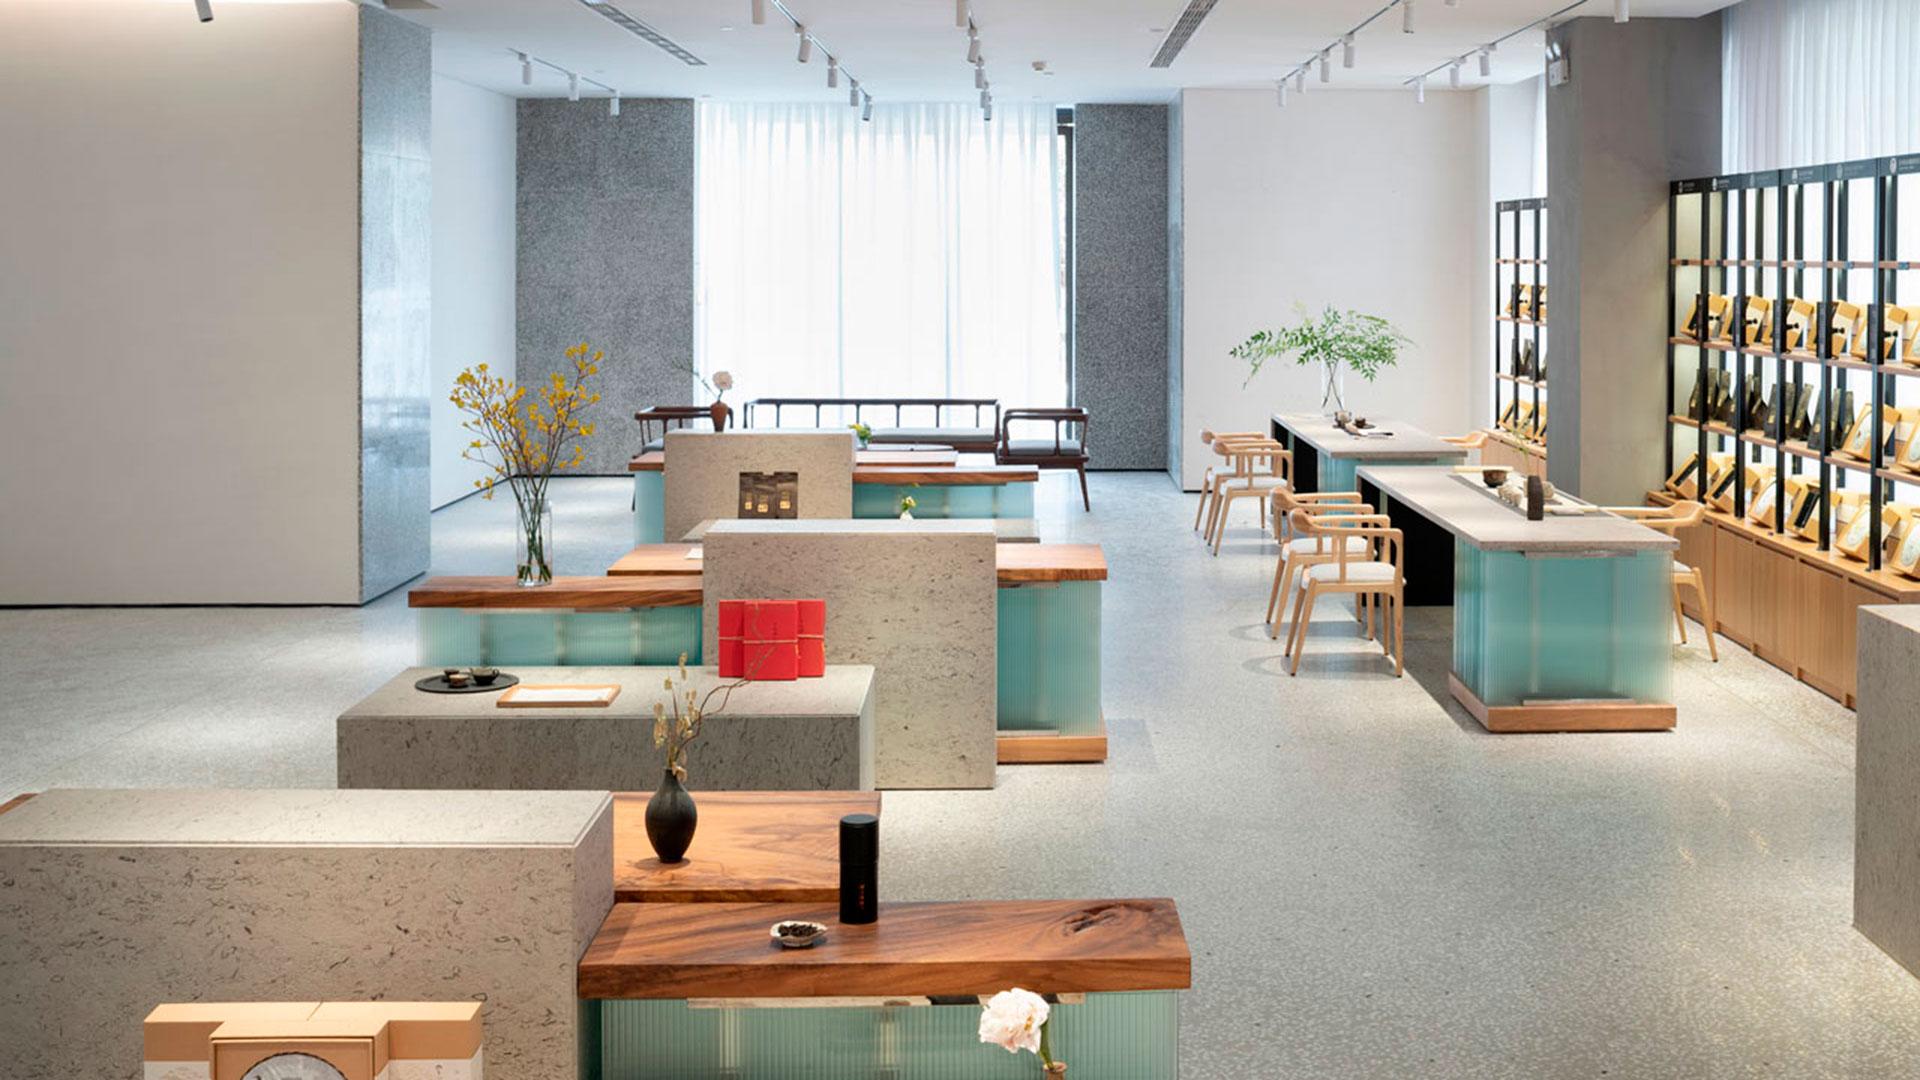 Ubicada en Hangzhou está diseñada por Kooo Architects